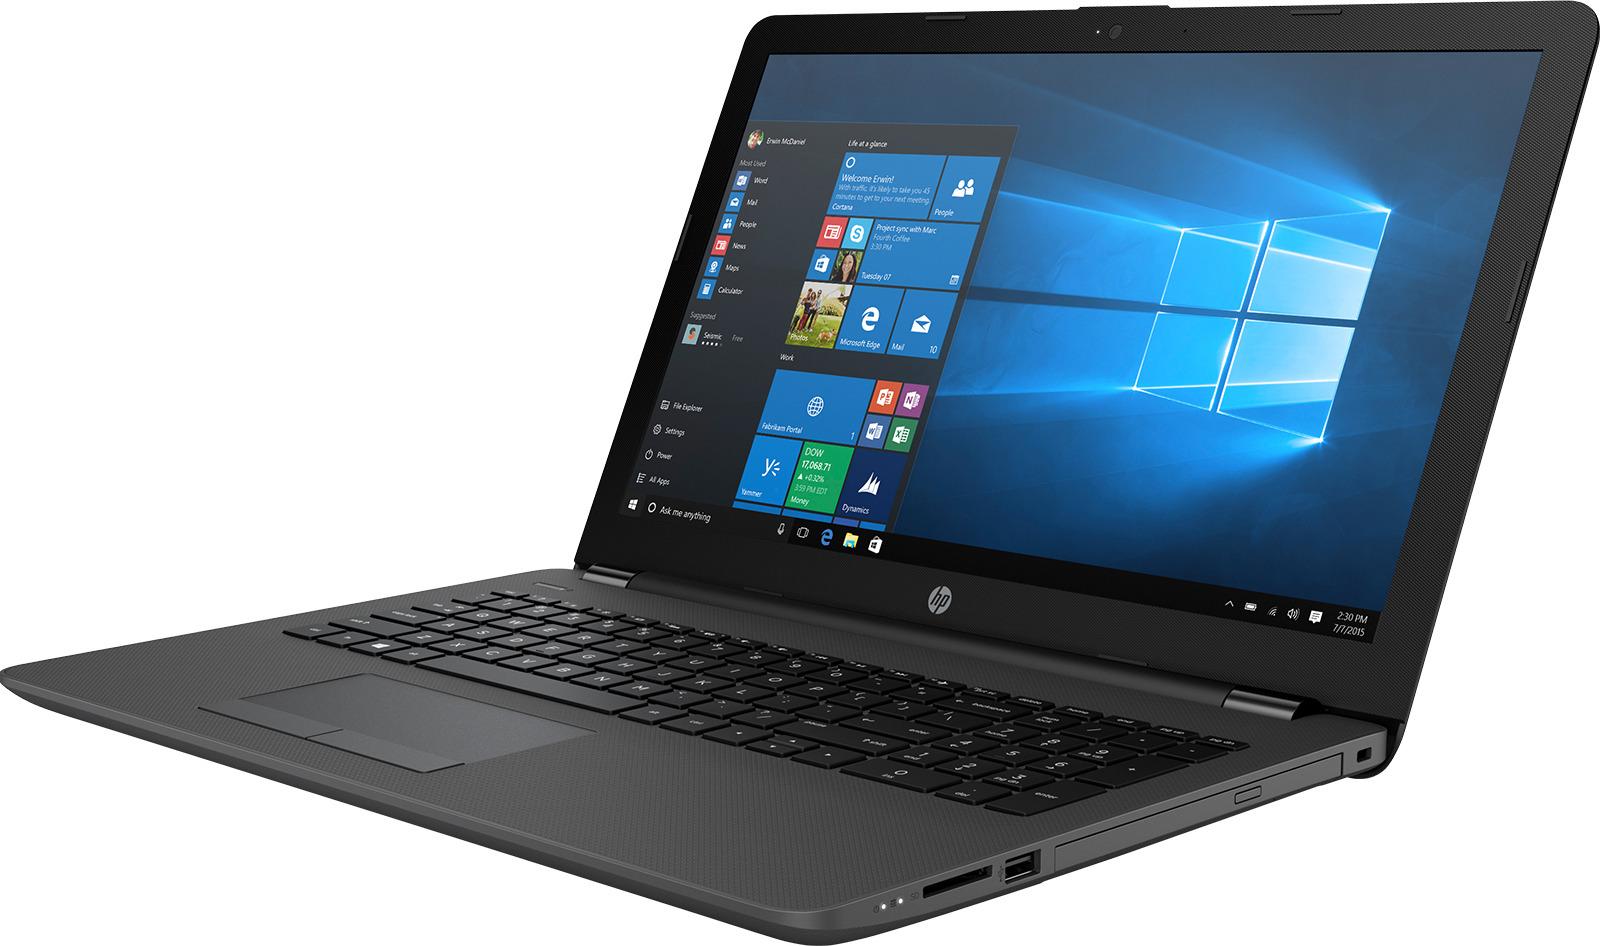 15.6 Ноутбук HP 250 G6 4LT08EA, серебристый